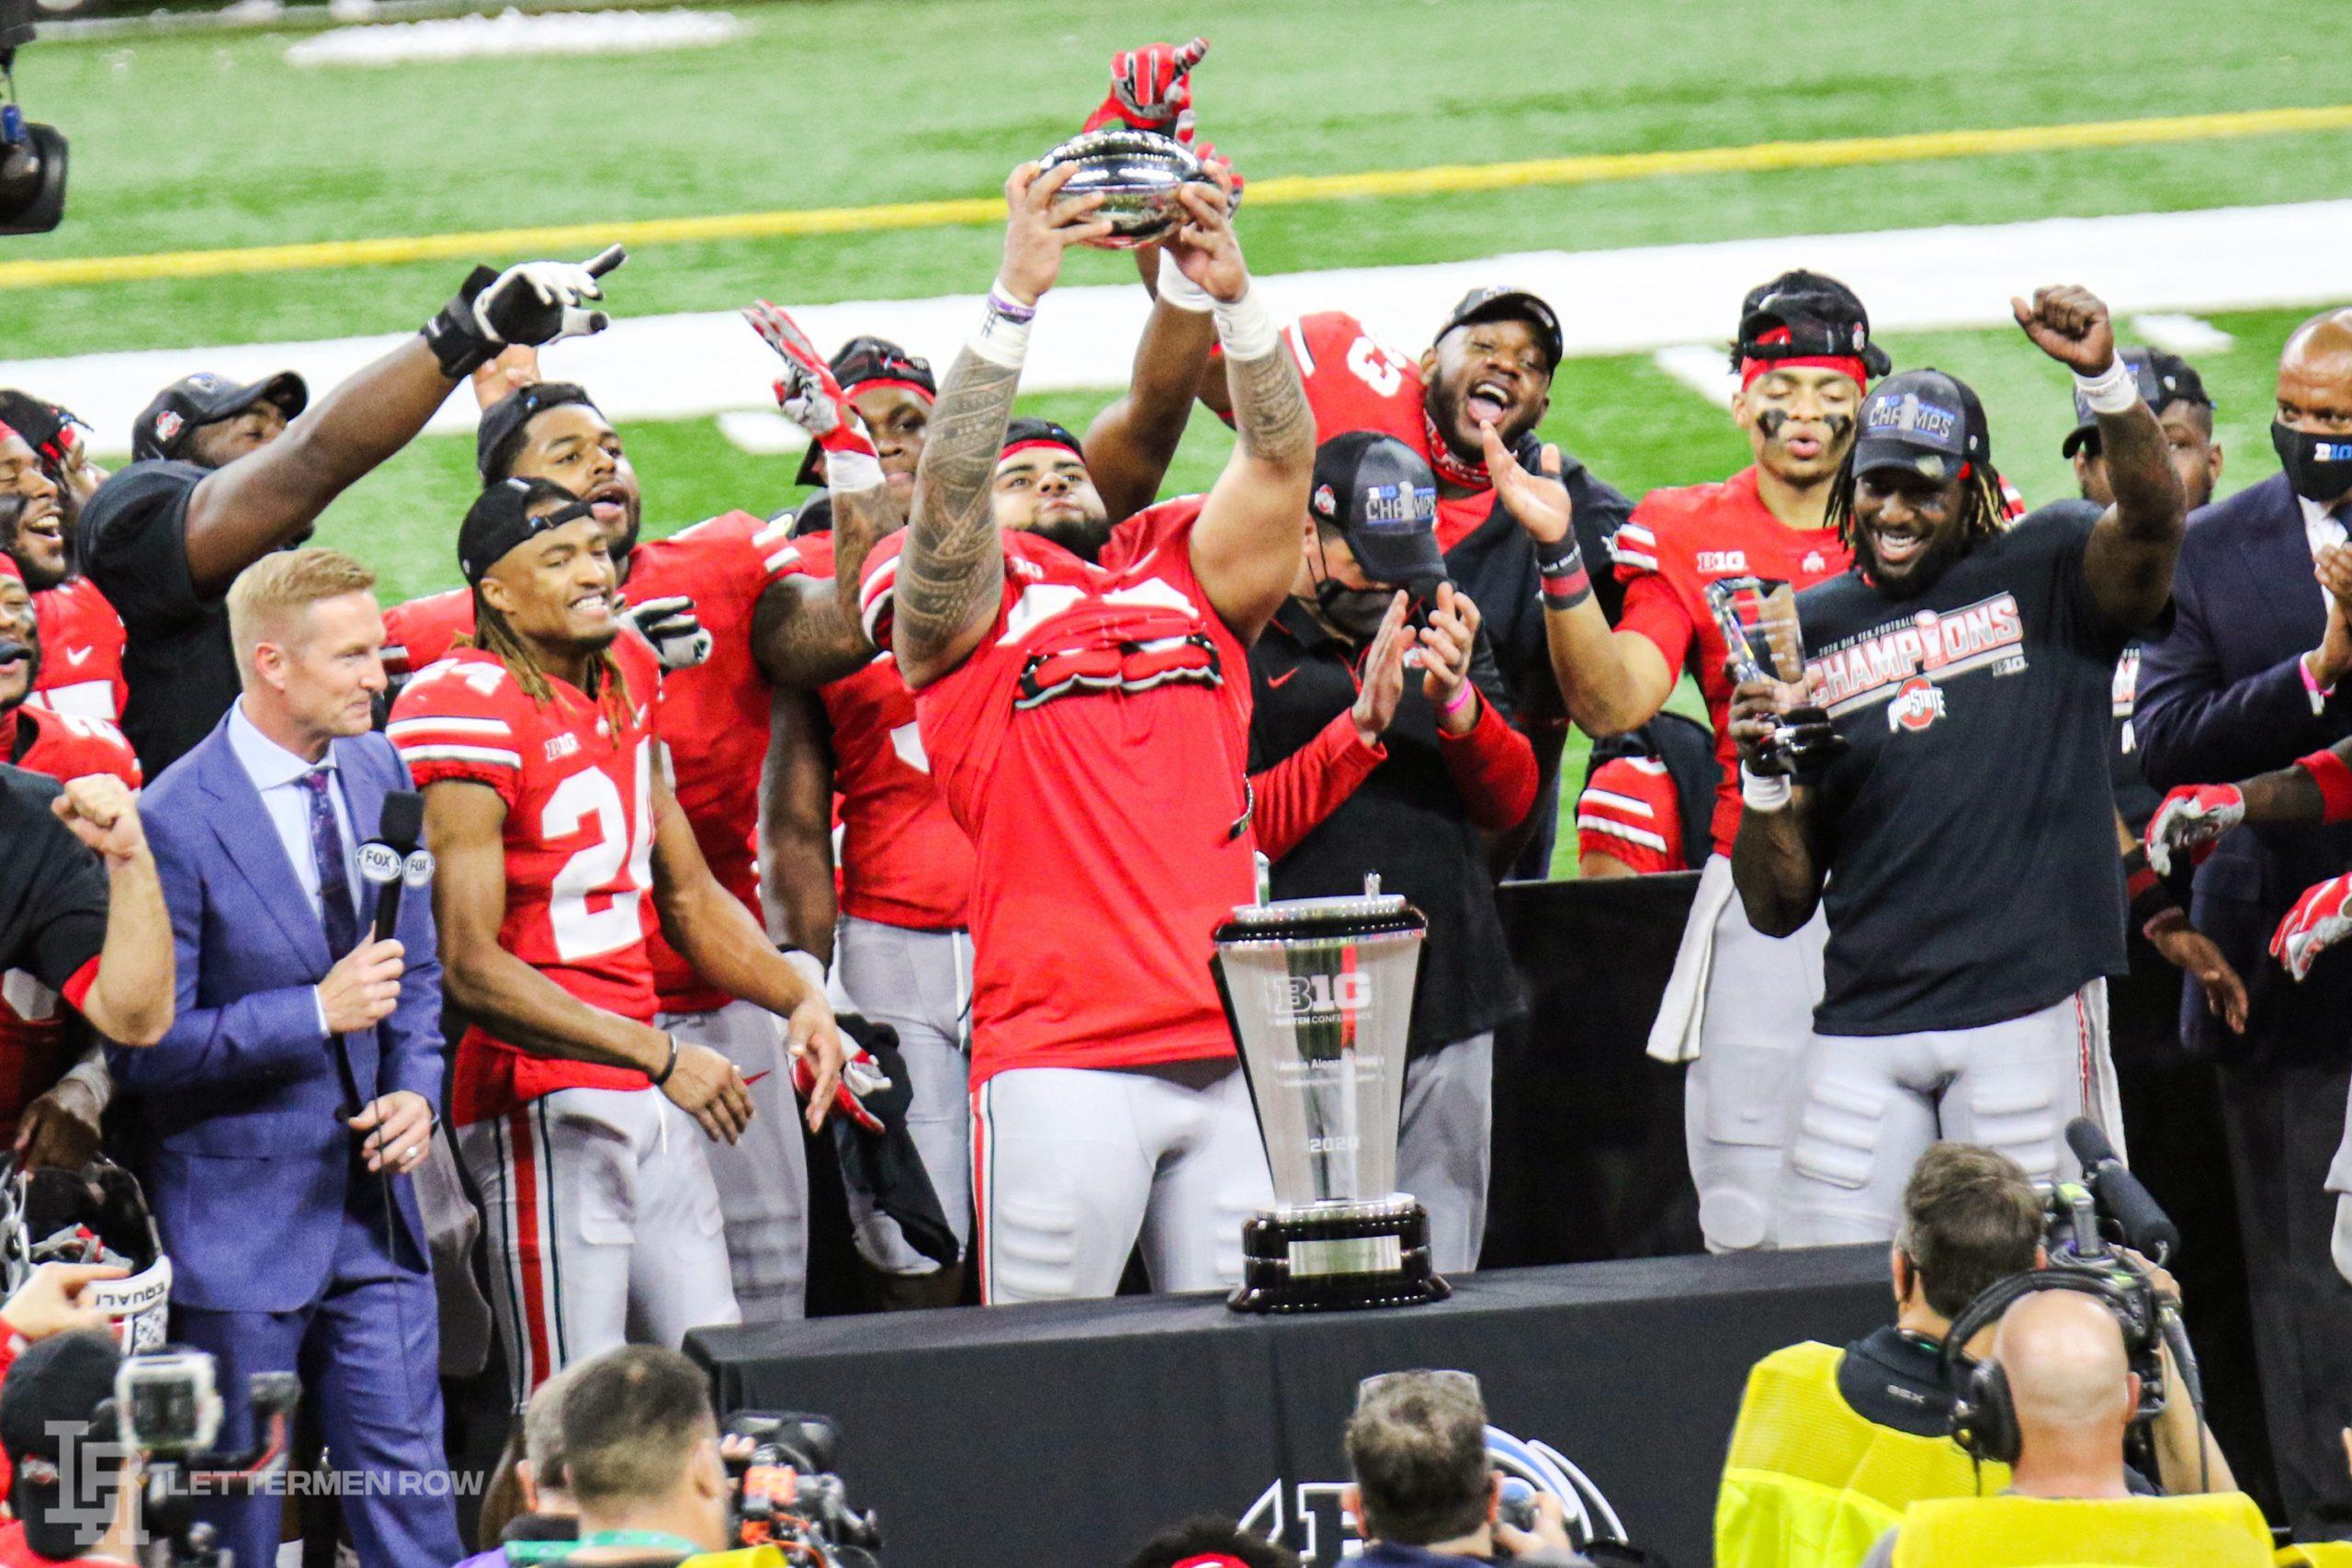 ohio state-ohio state big ten championship 2020-ohio state northwestern-ohio state trey sermon-ohio state big ten title stats highlights-ohio state buckeyes football